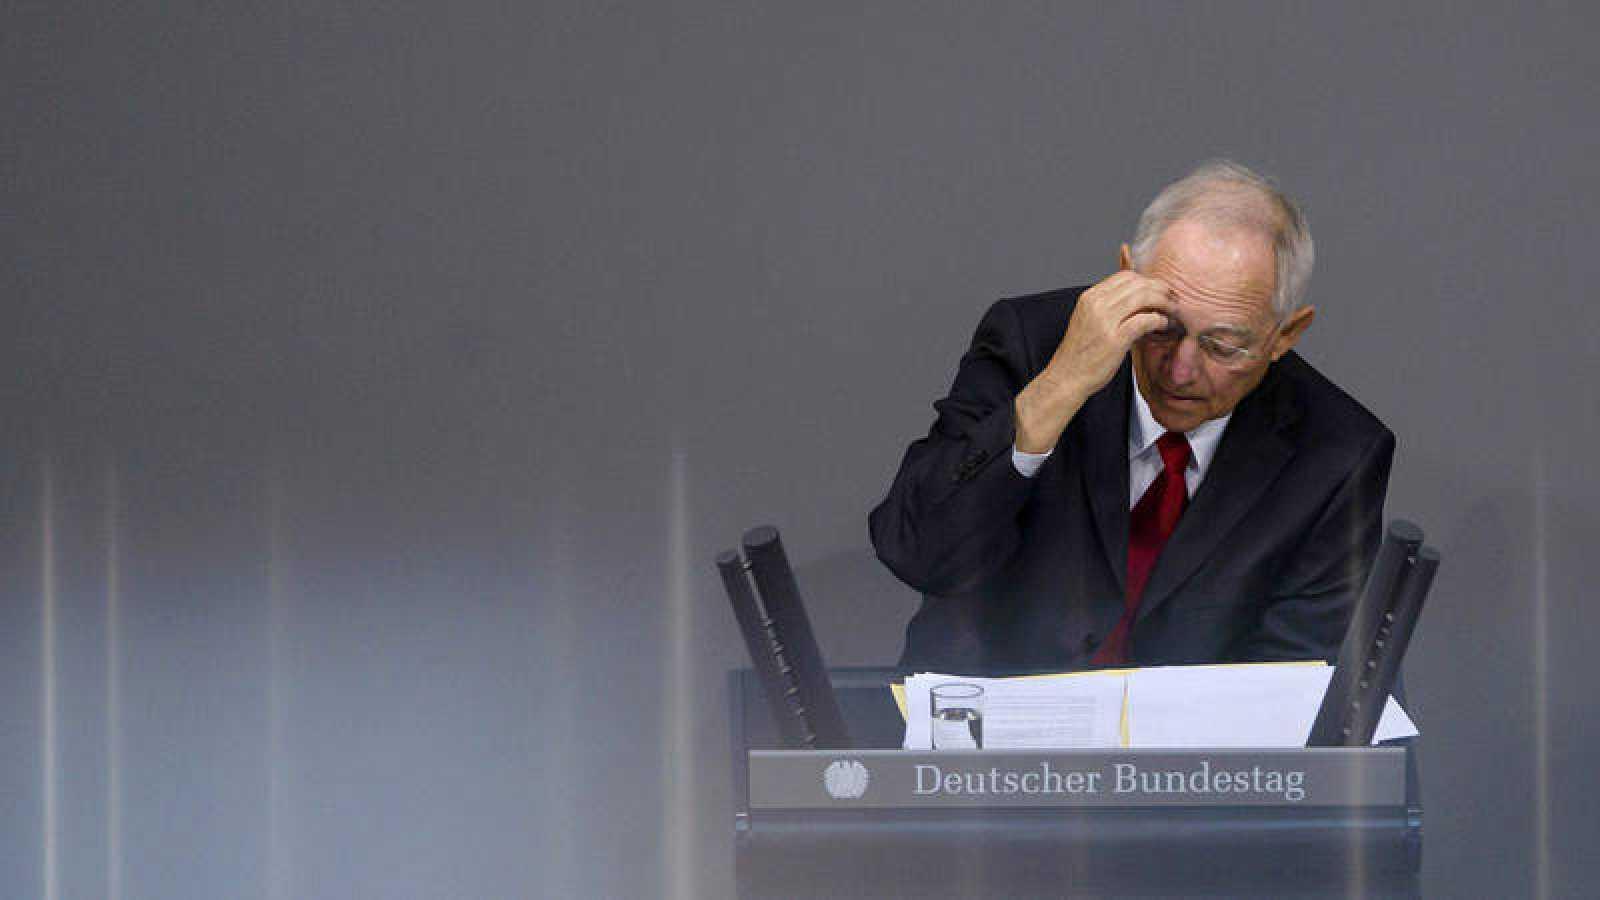 Wolfgang Schäuble en el Bundestag